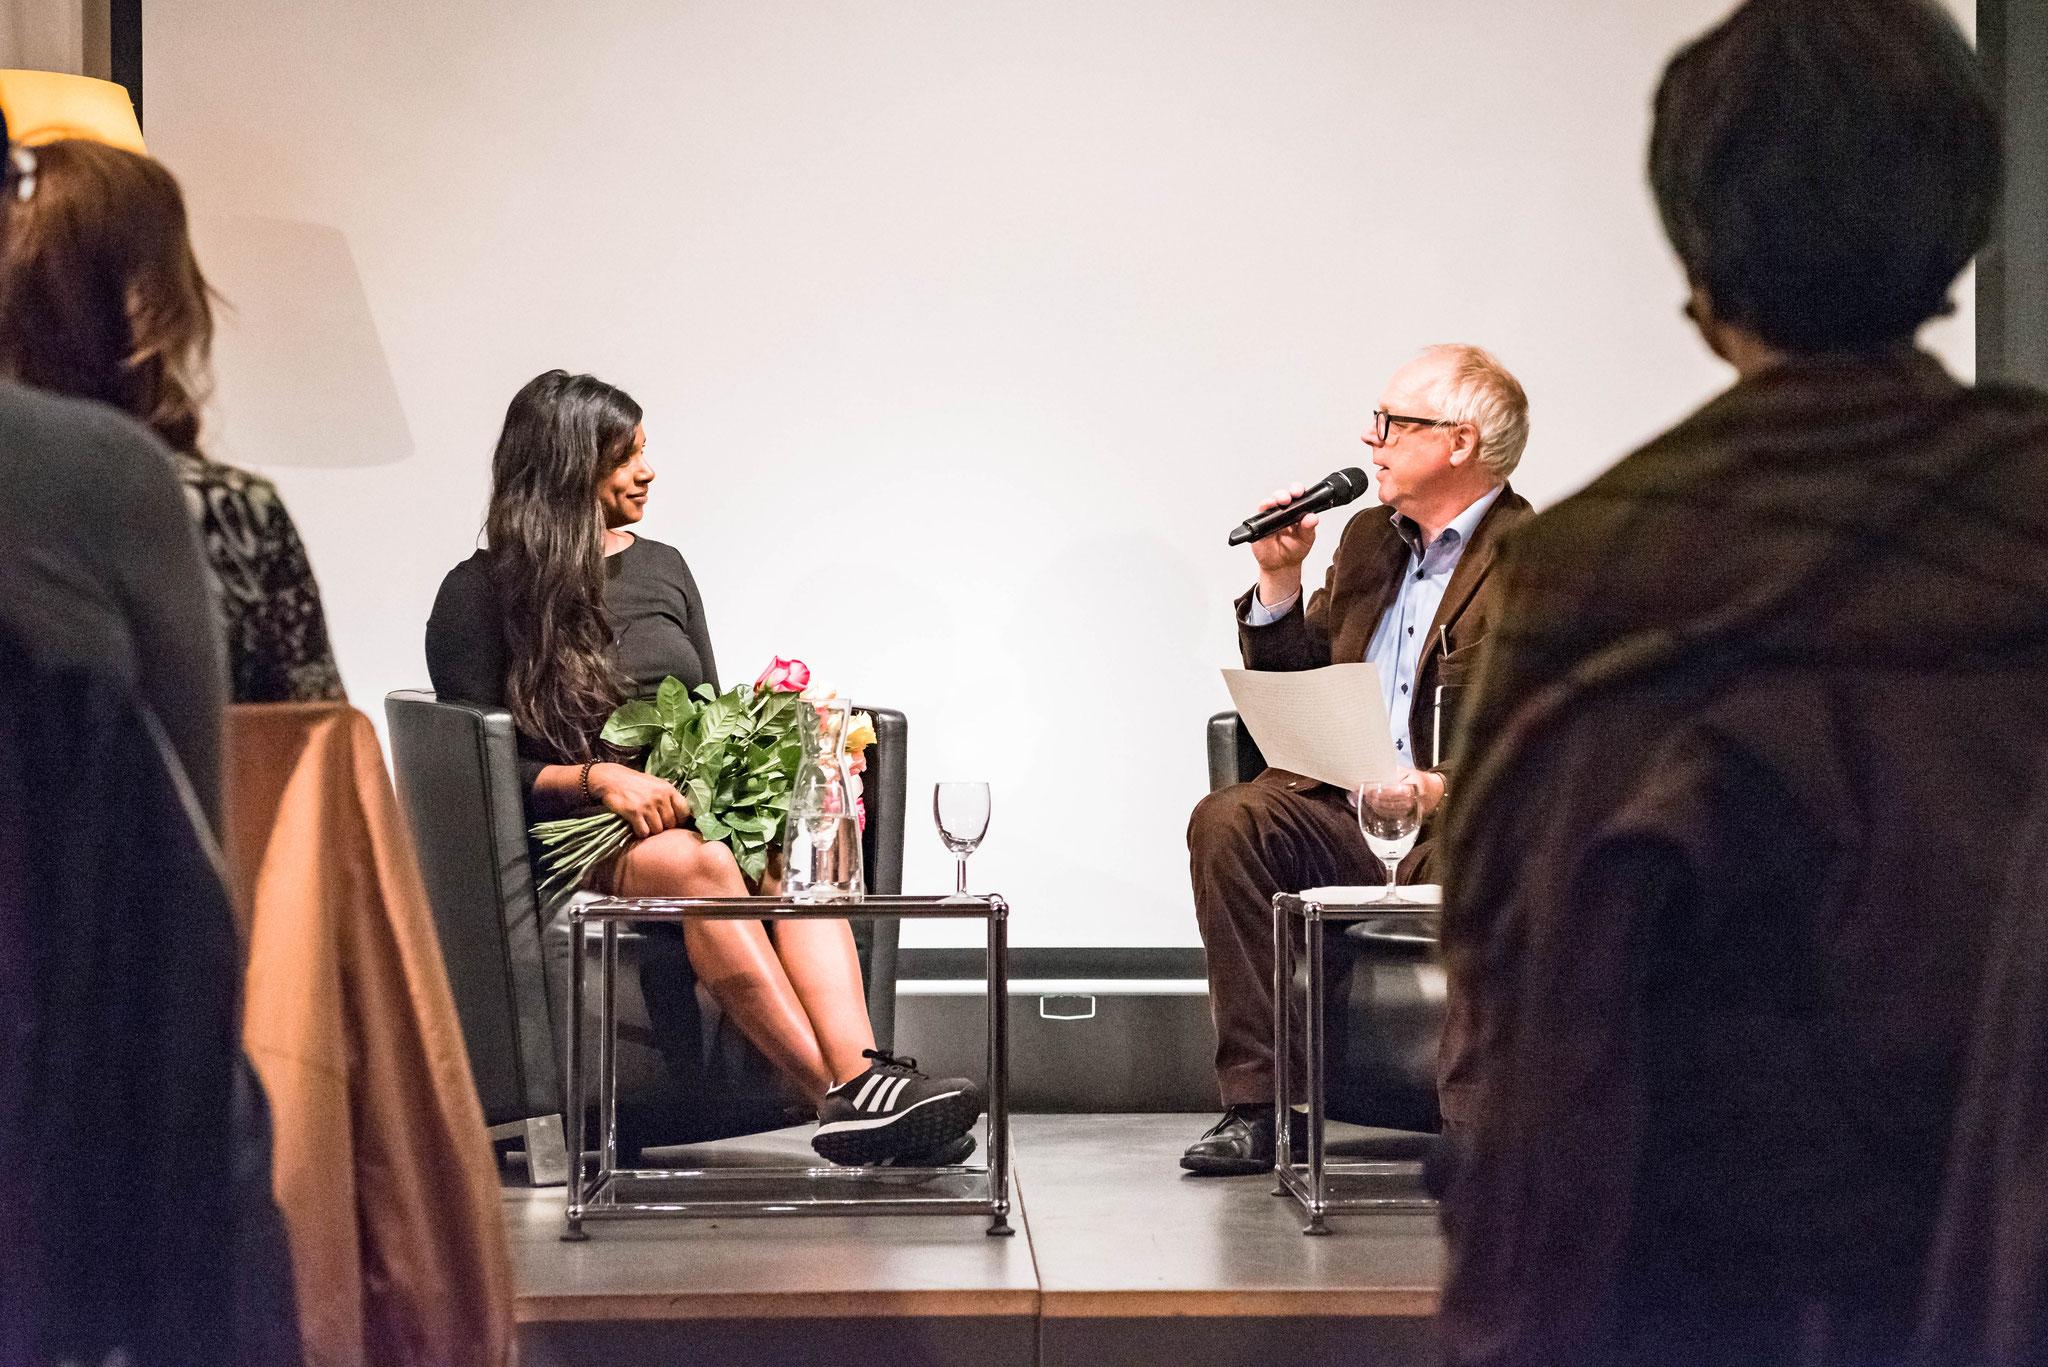 Thomas Göttin (Geschäftsleiter Polit-Forum Bern) und Carmela Harshani Odoni